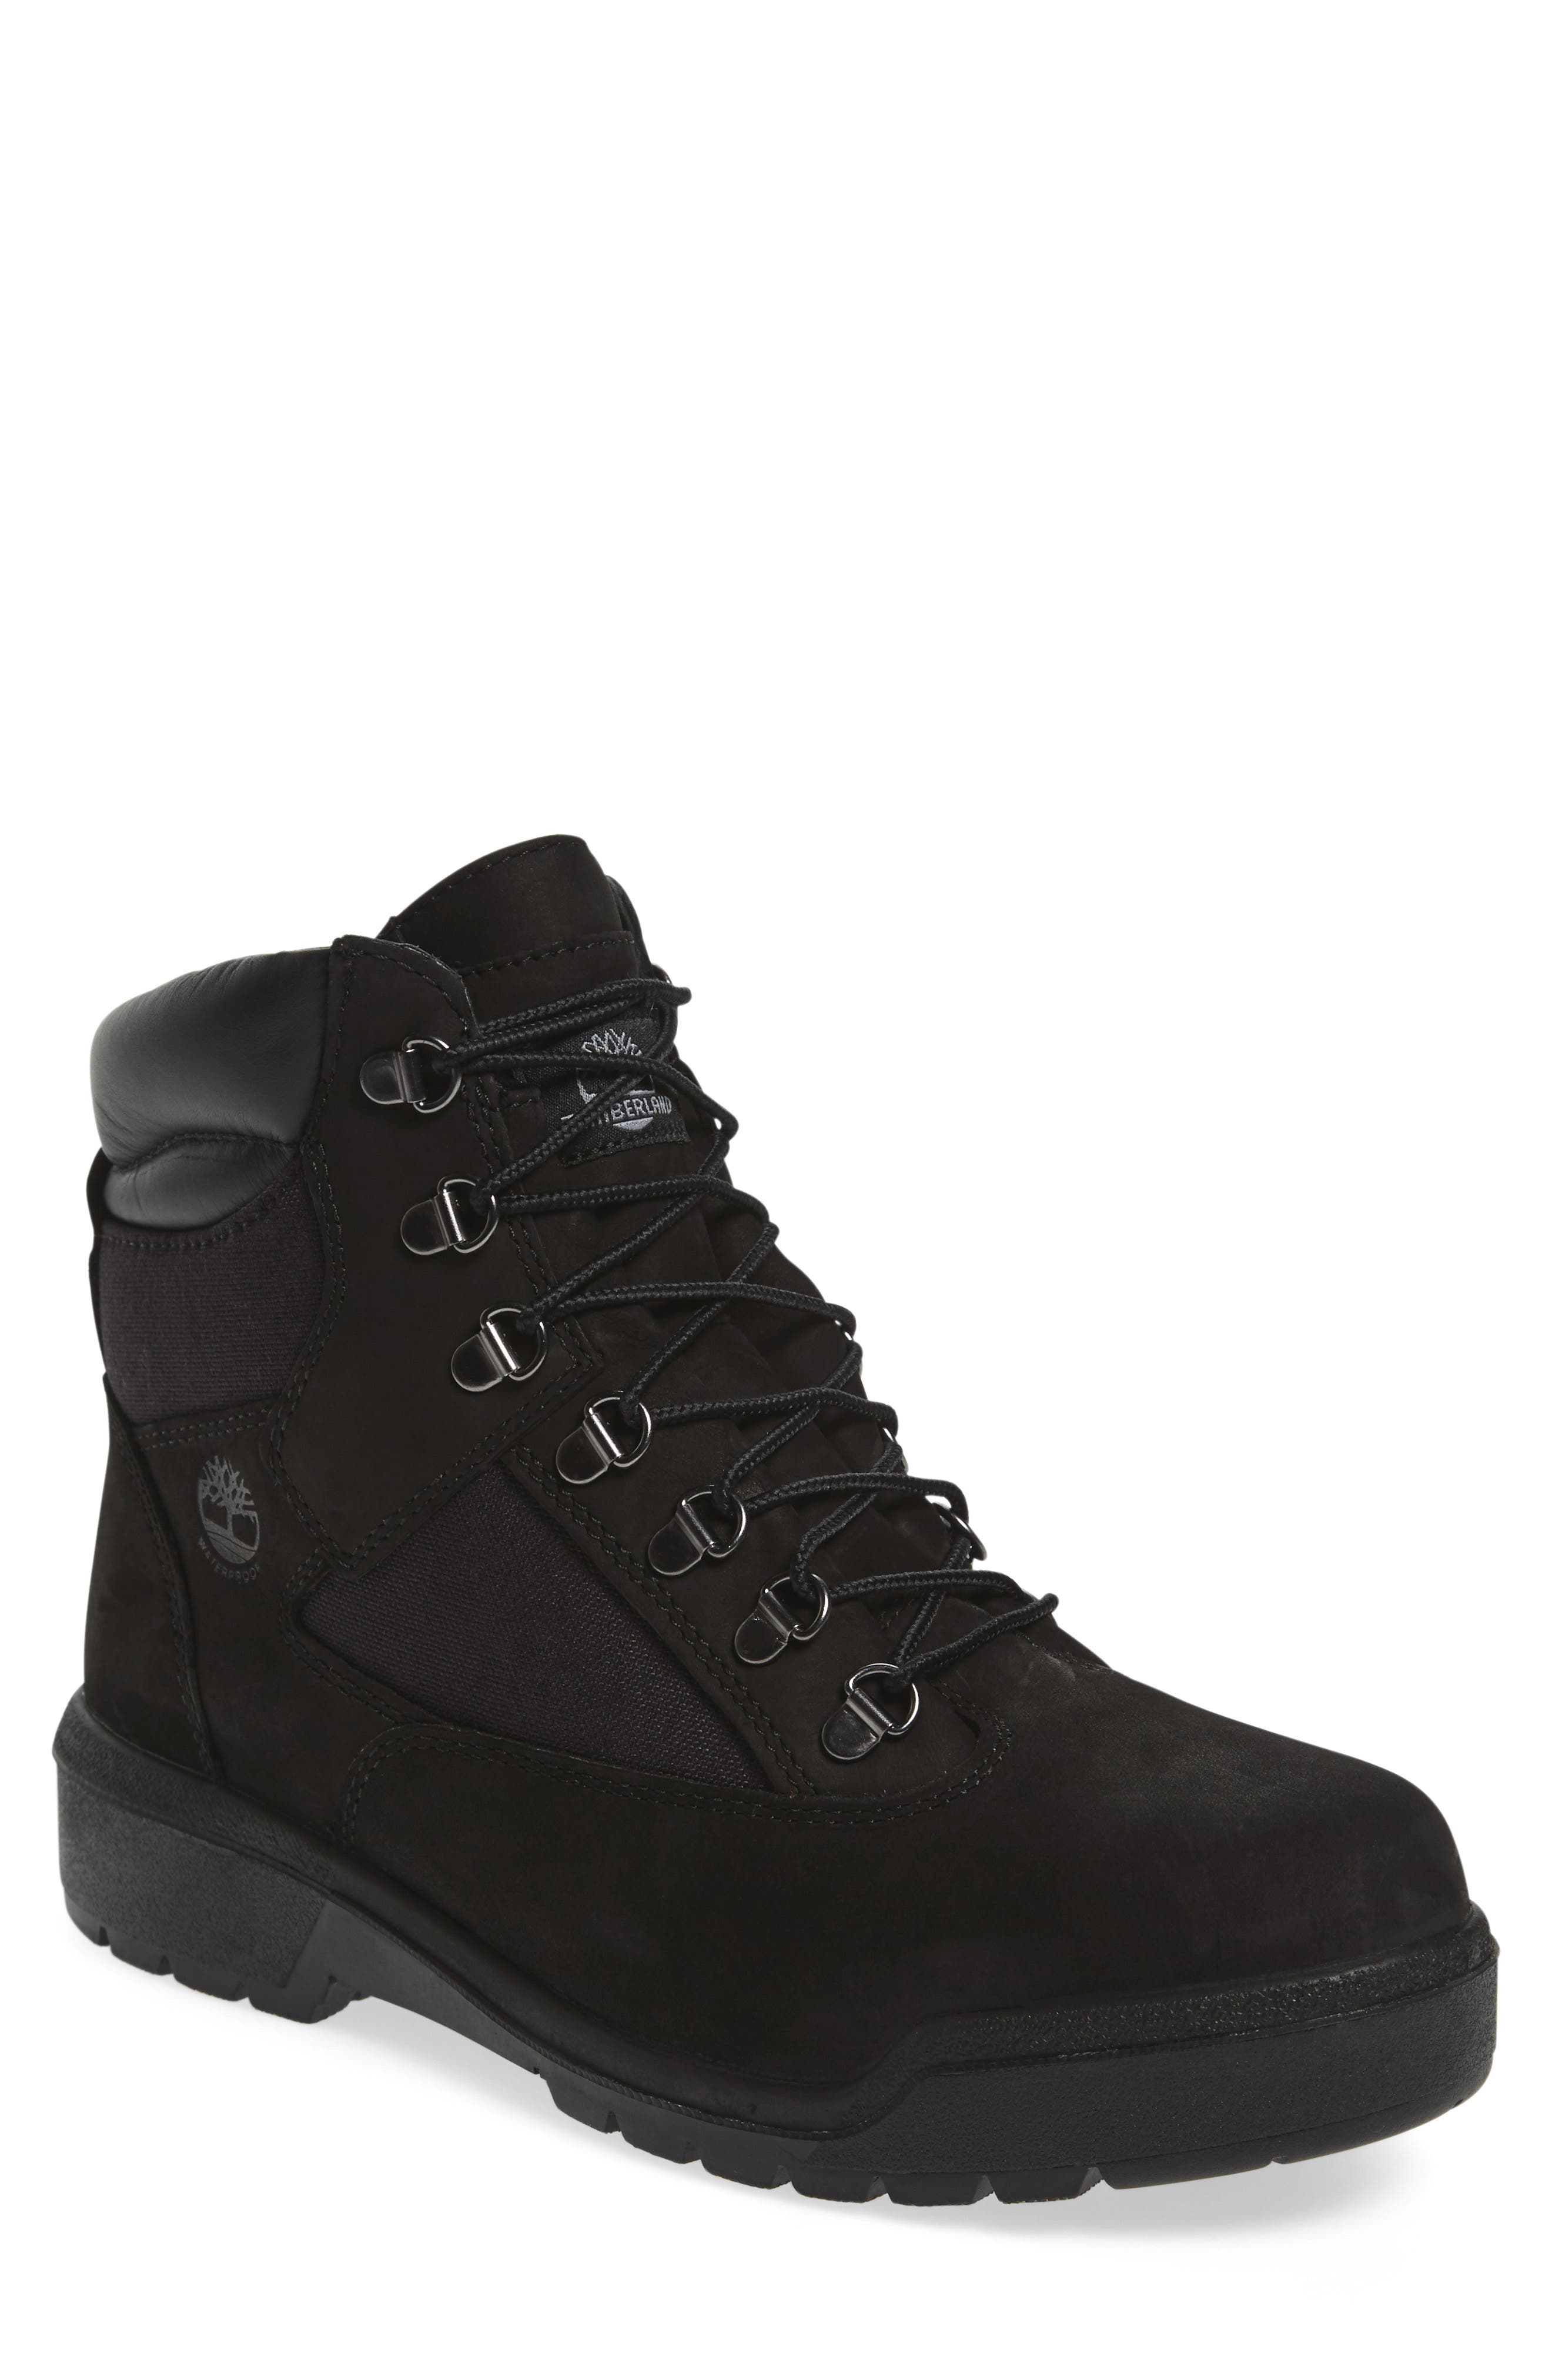 Alternate Image 1 Selected - Timberland Field Waterproof Boot (Men)